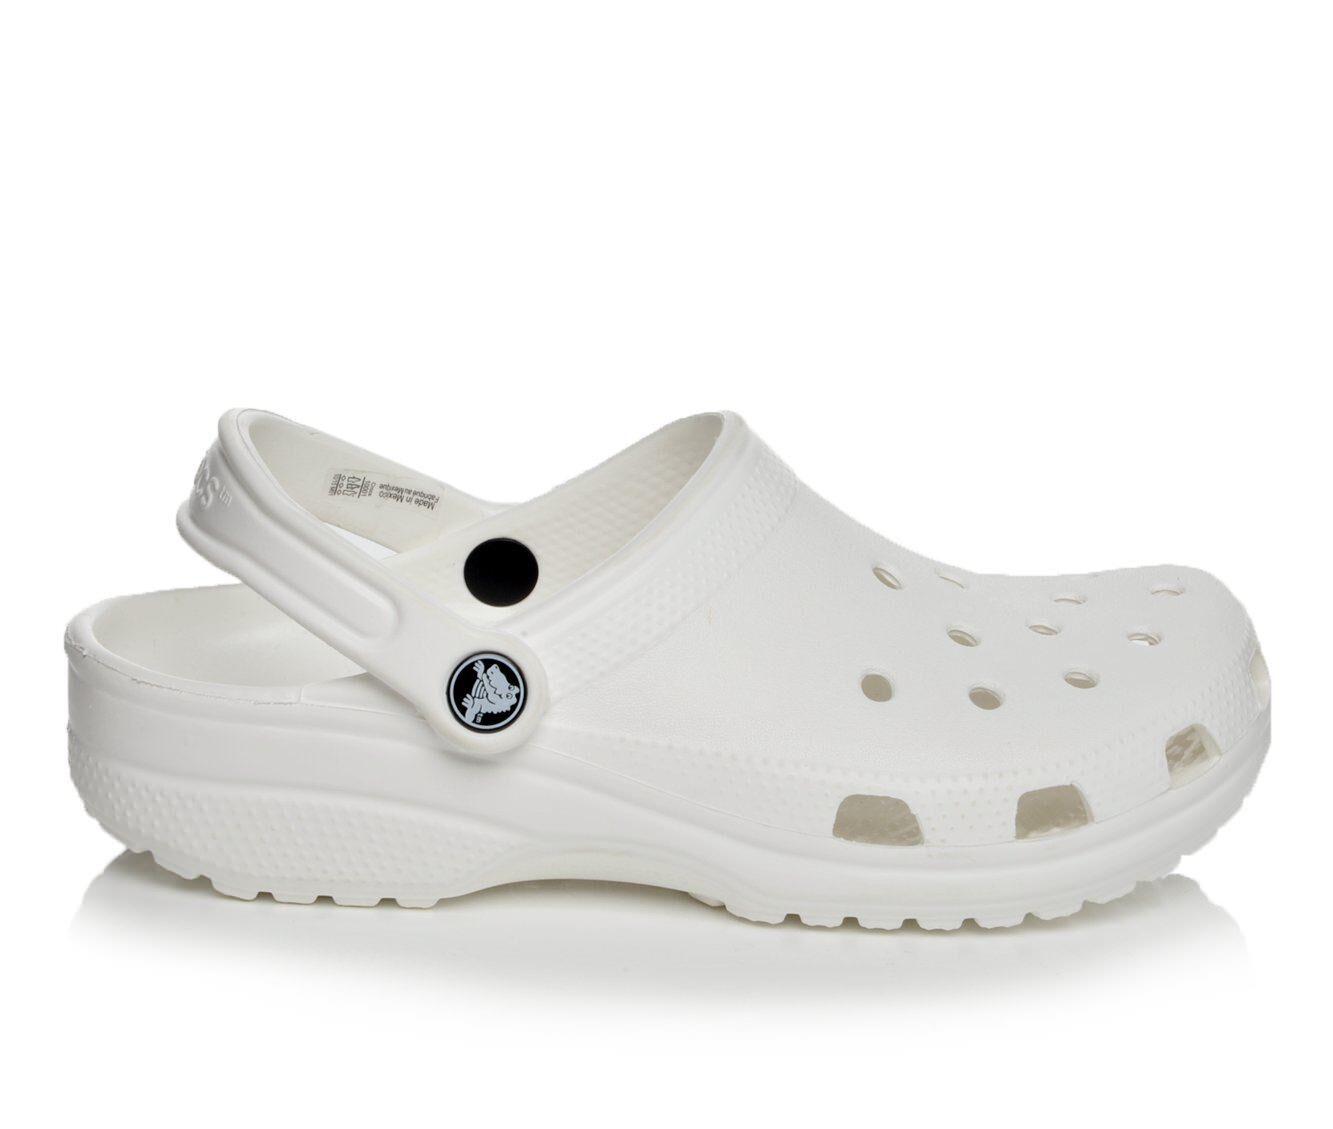 Women's Crocs Classic Clogs White